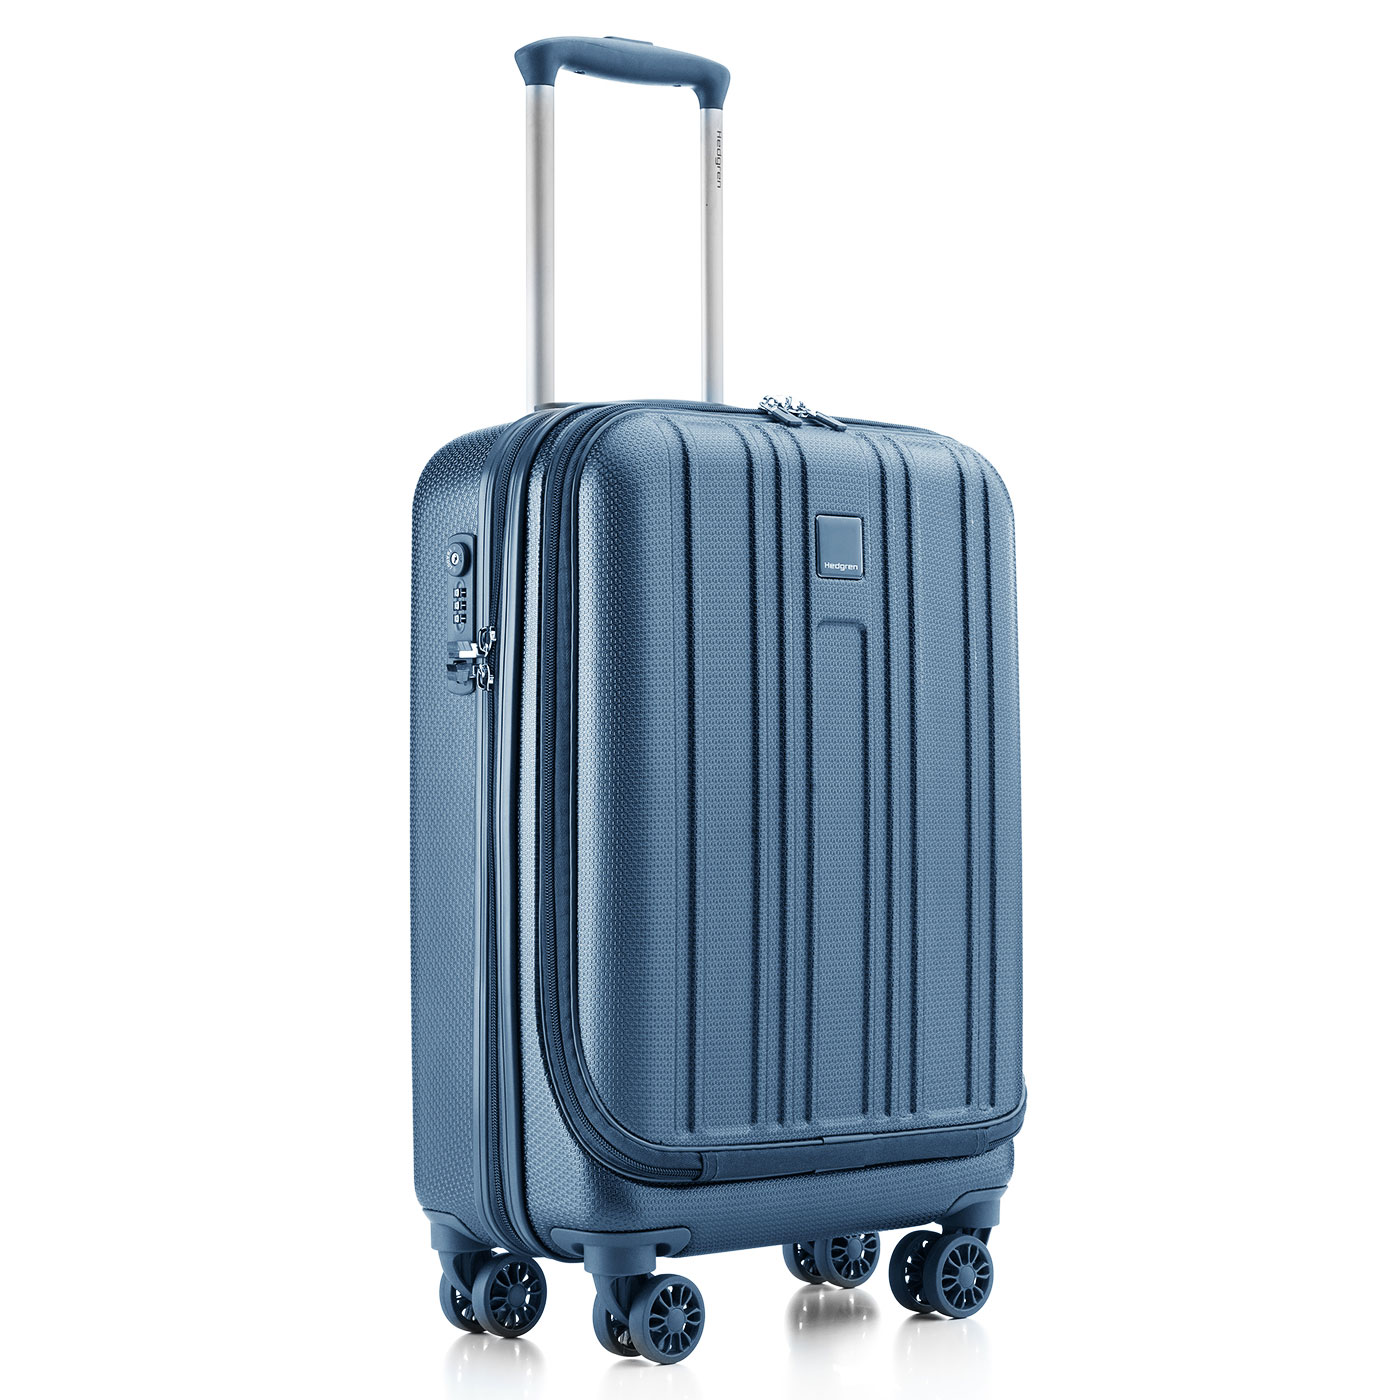 Hedgren transit boarding s bleu clair sac sacoche for Valise makita avec tous ses accessoires